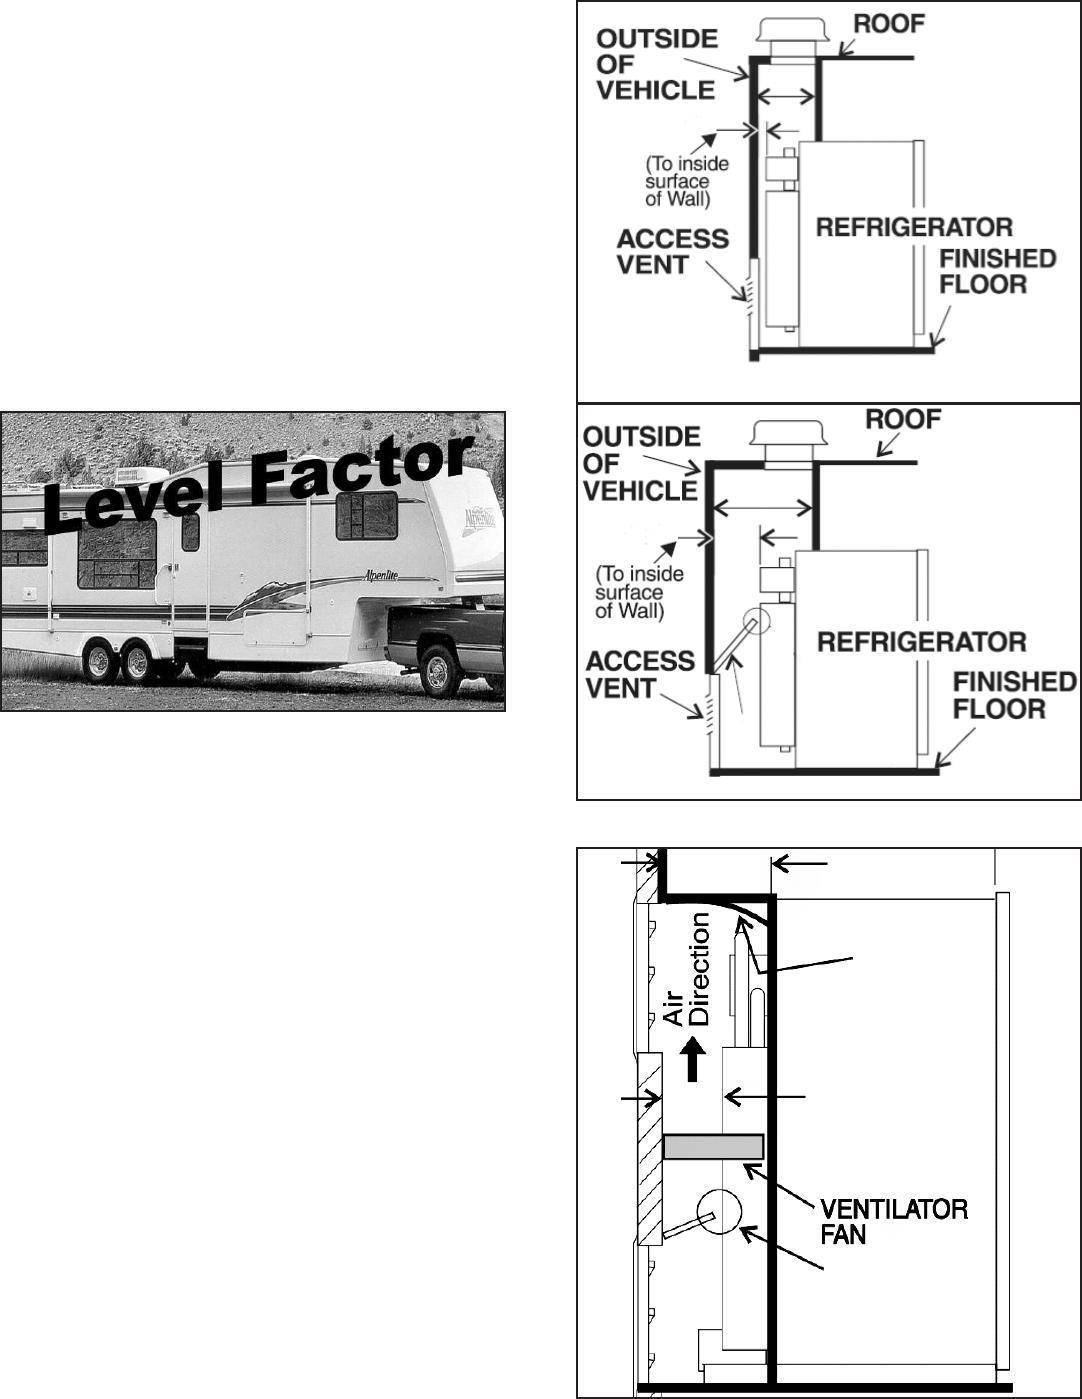 hight resolution of  wiring diagram rv refrigerator dometic rm 2351 rm 2354 rm 2451 rm 2454 rm 2551